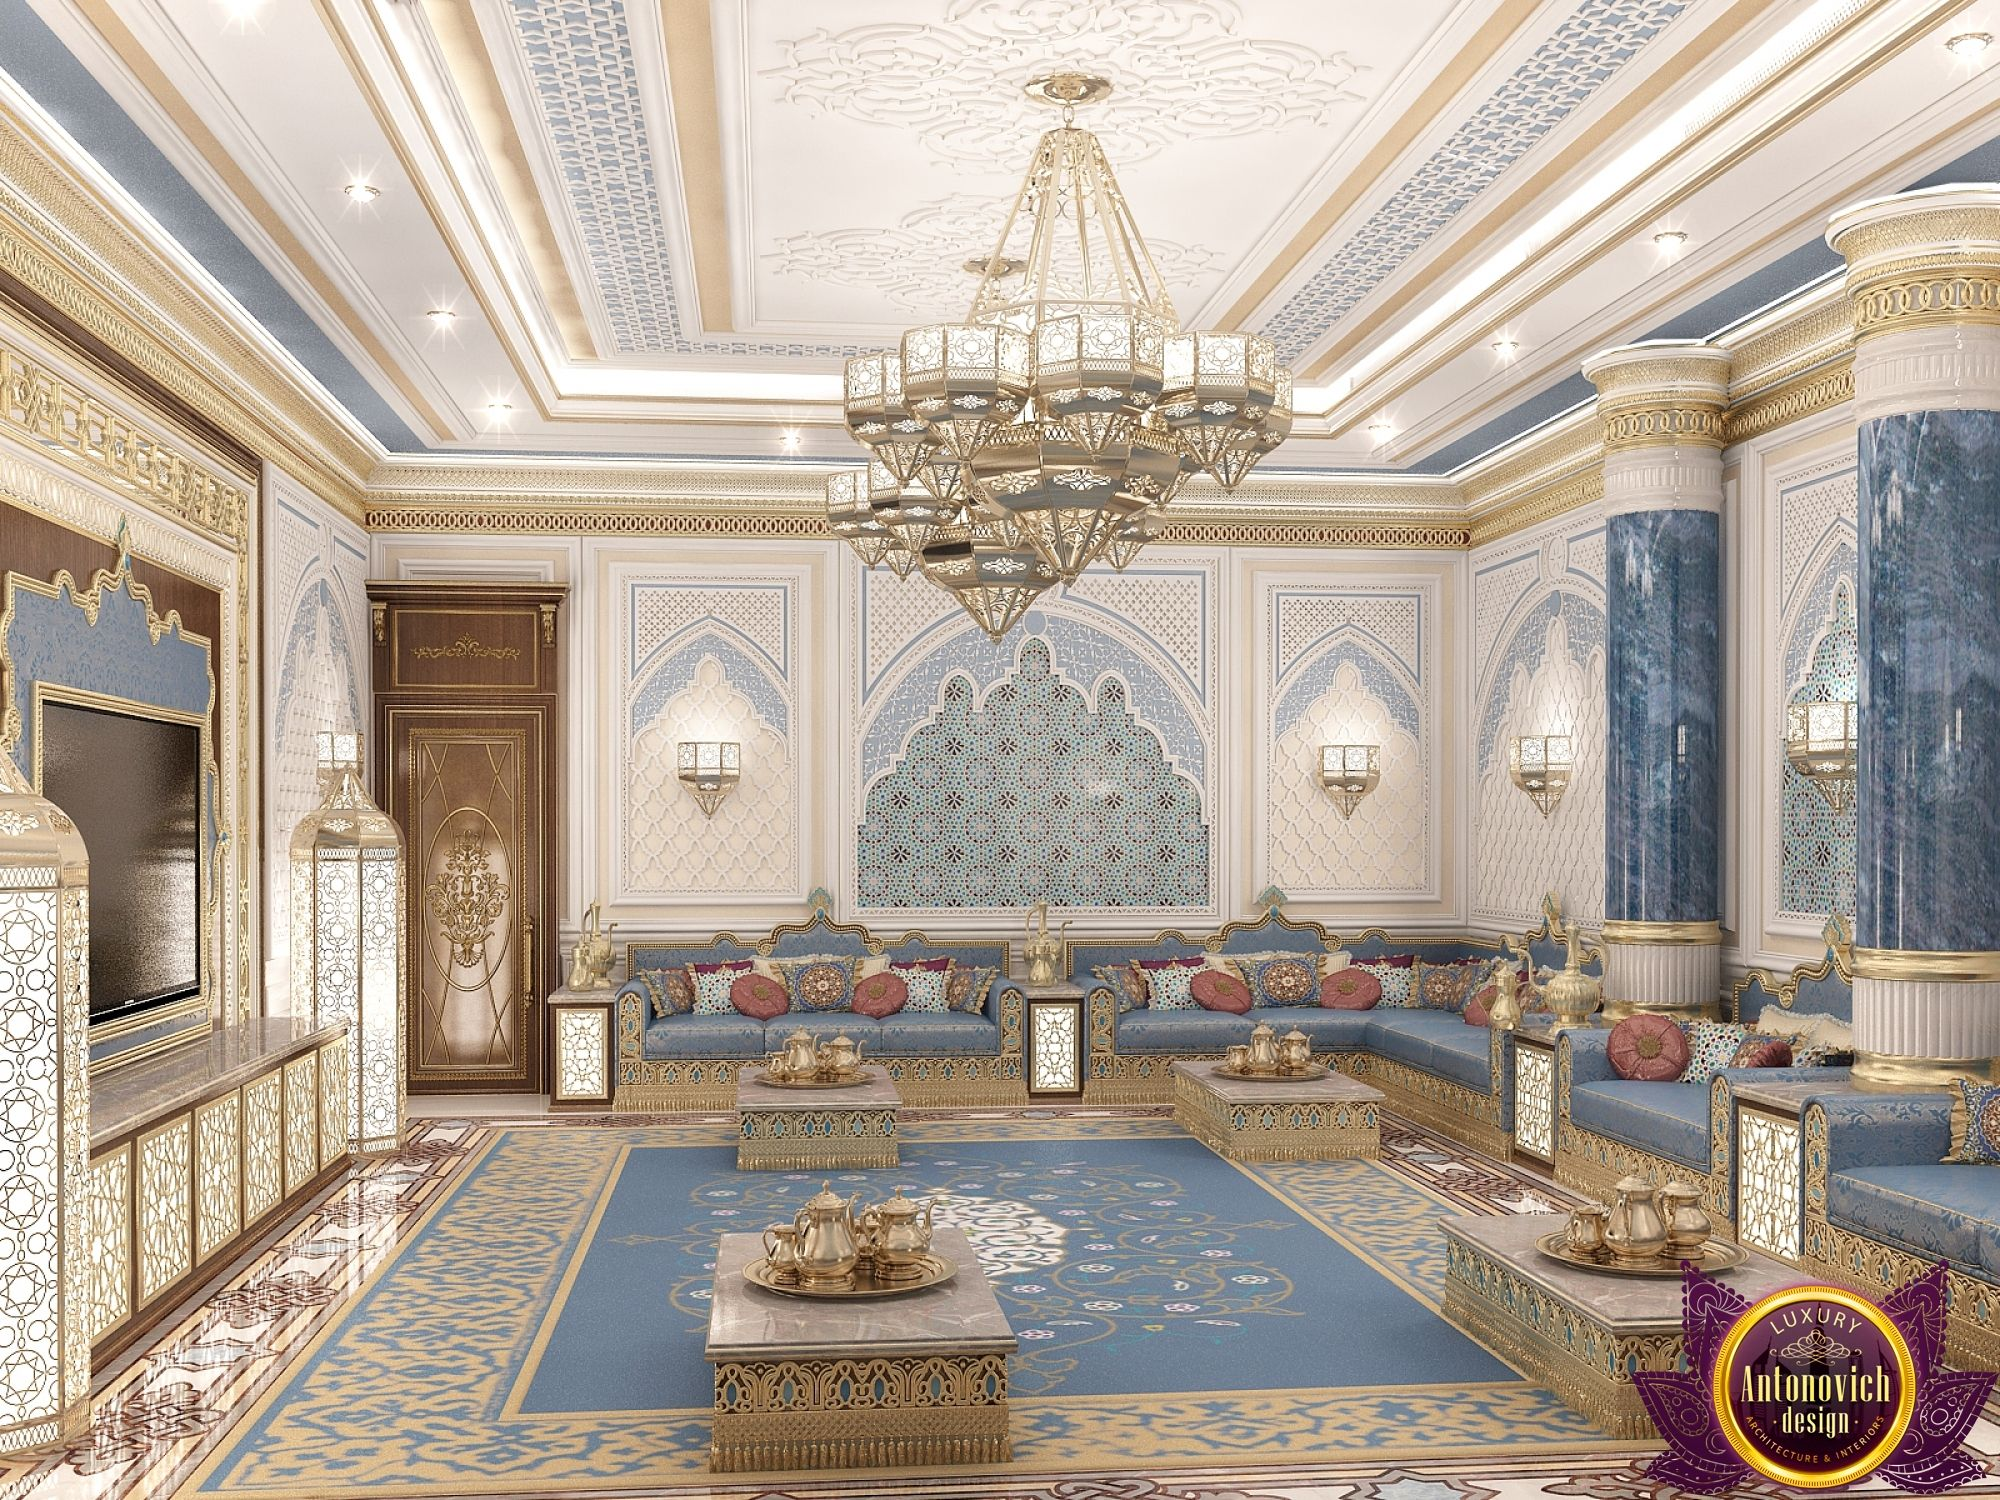 3d Wallpaper Designs For Hall Majlis Interior Design In Dubai Luxury Arabic Majlis